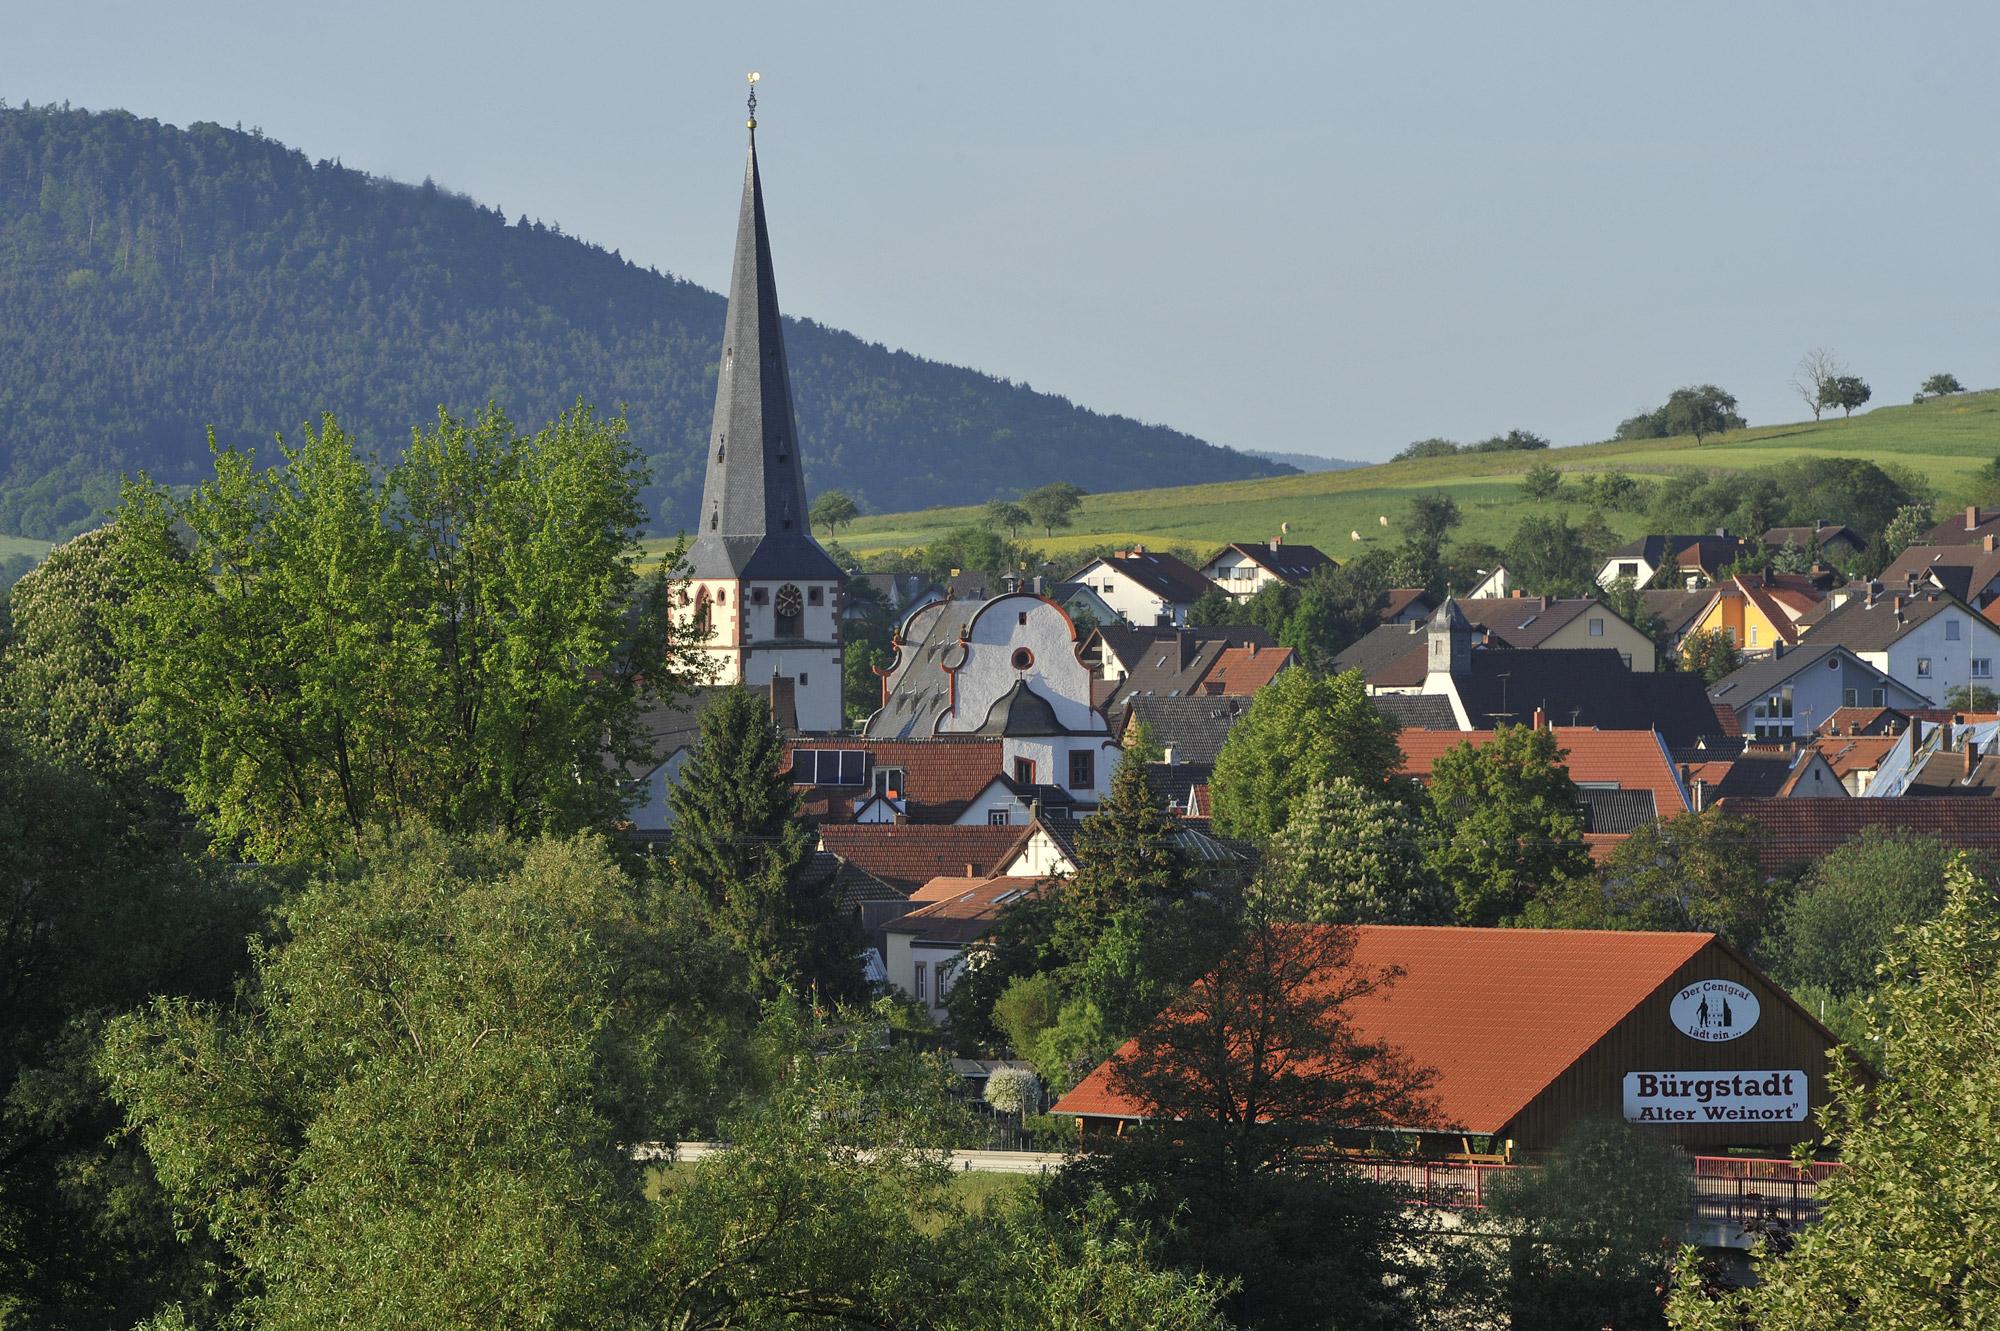 Churfranken - Bürgstadt